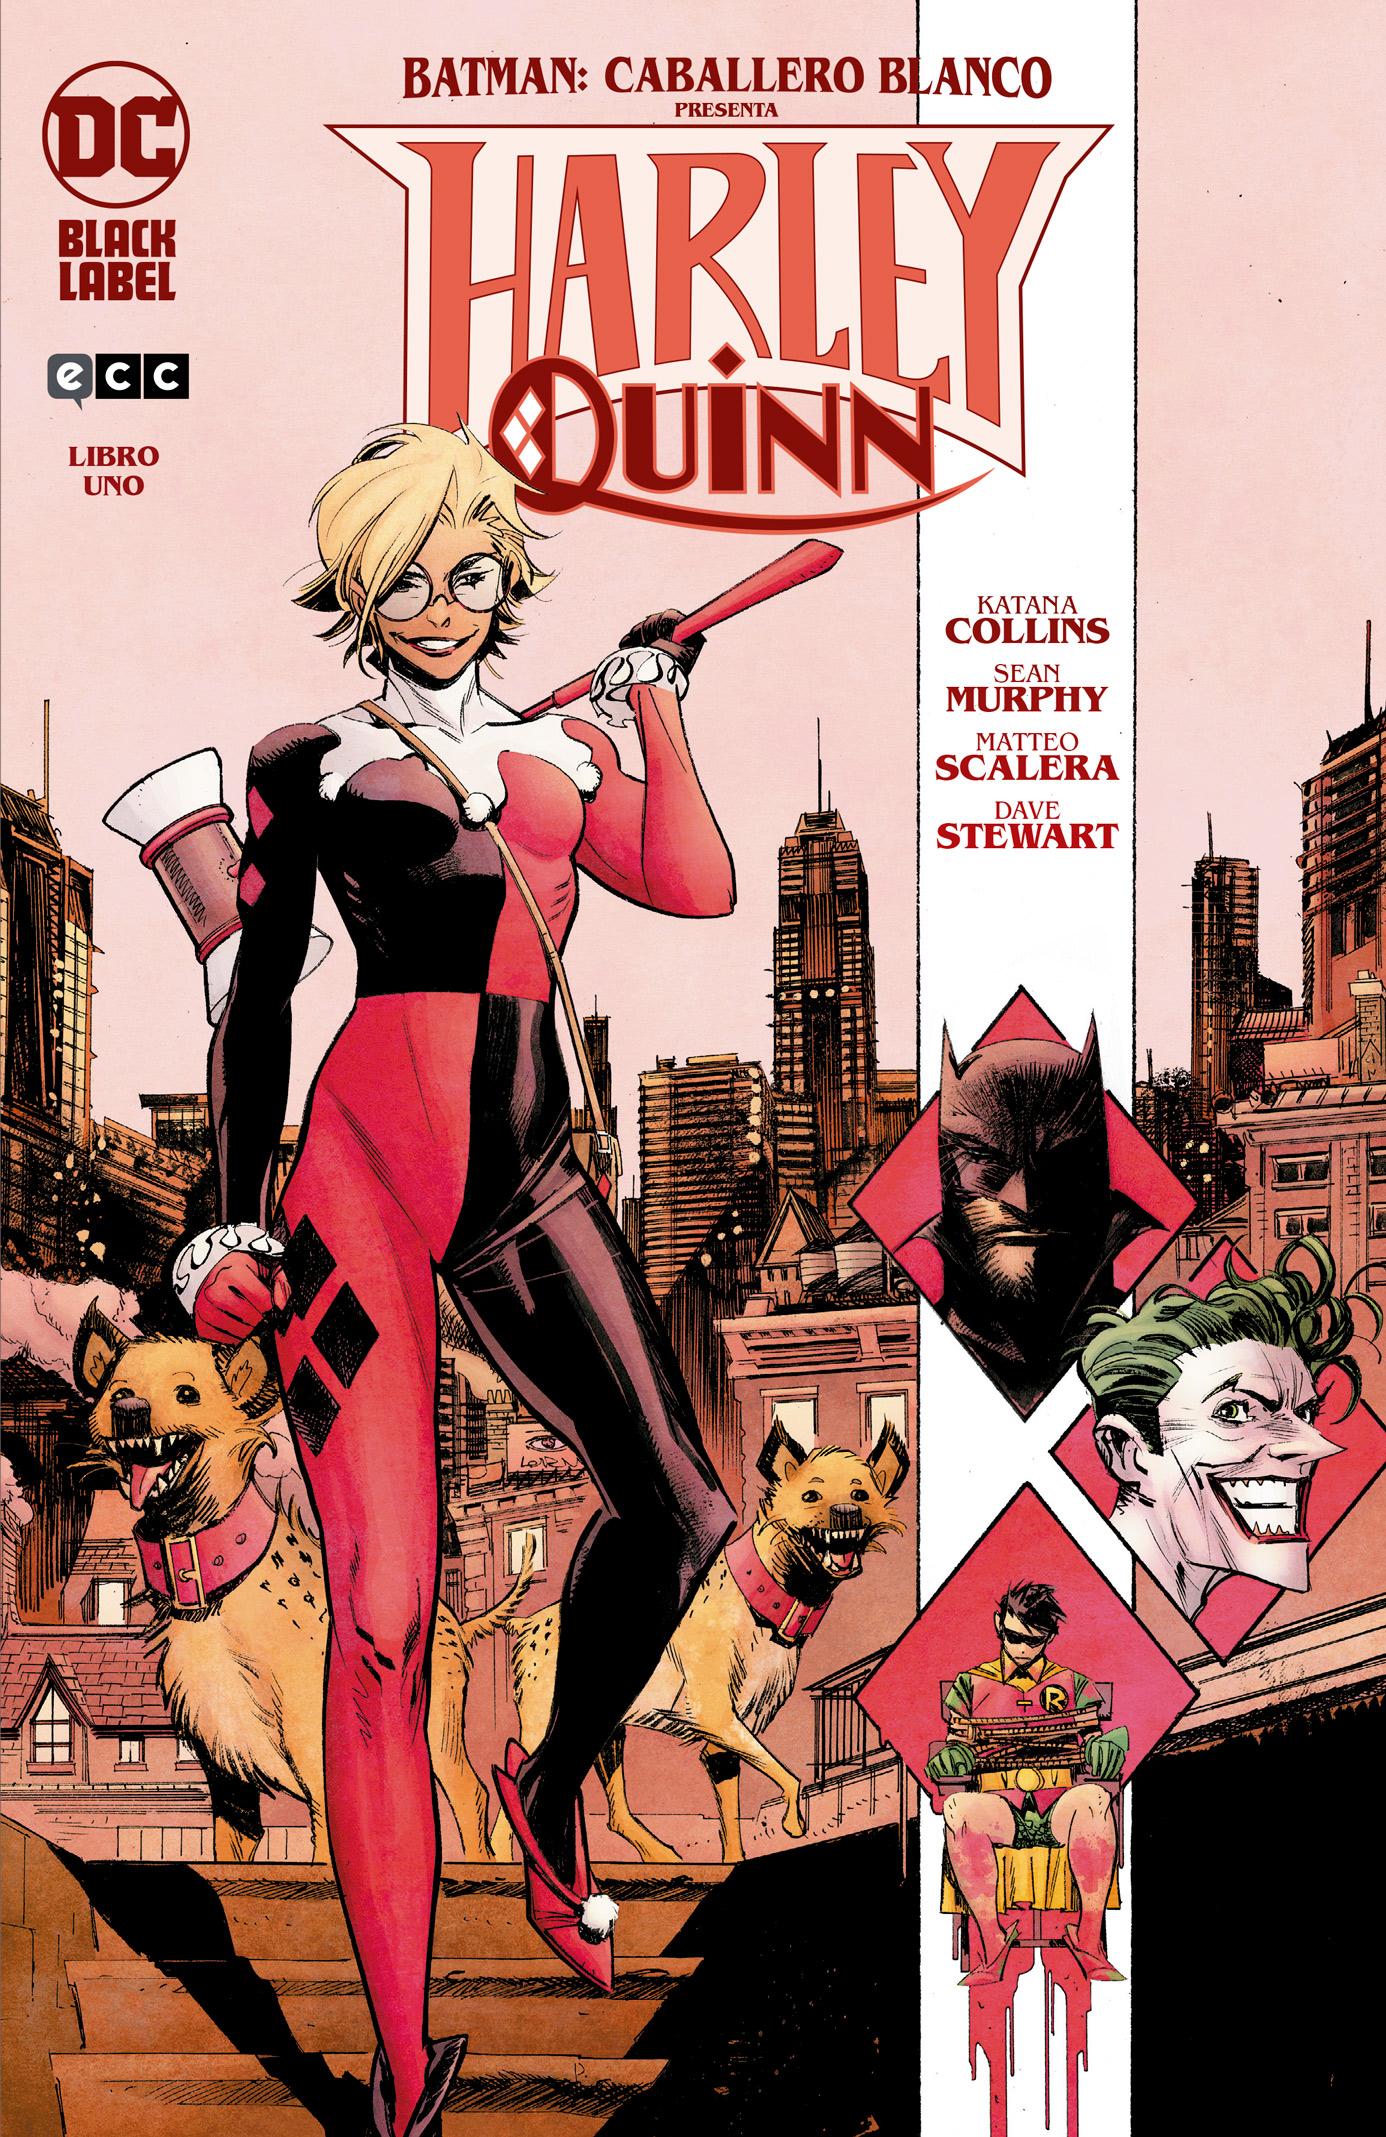 Batman: Caballero Blanco presenta - Harley Quinn #1 de 6